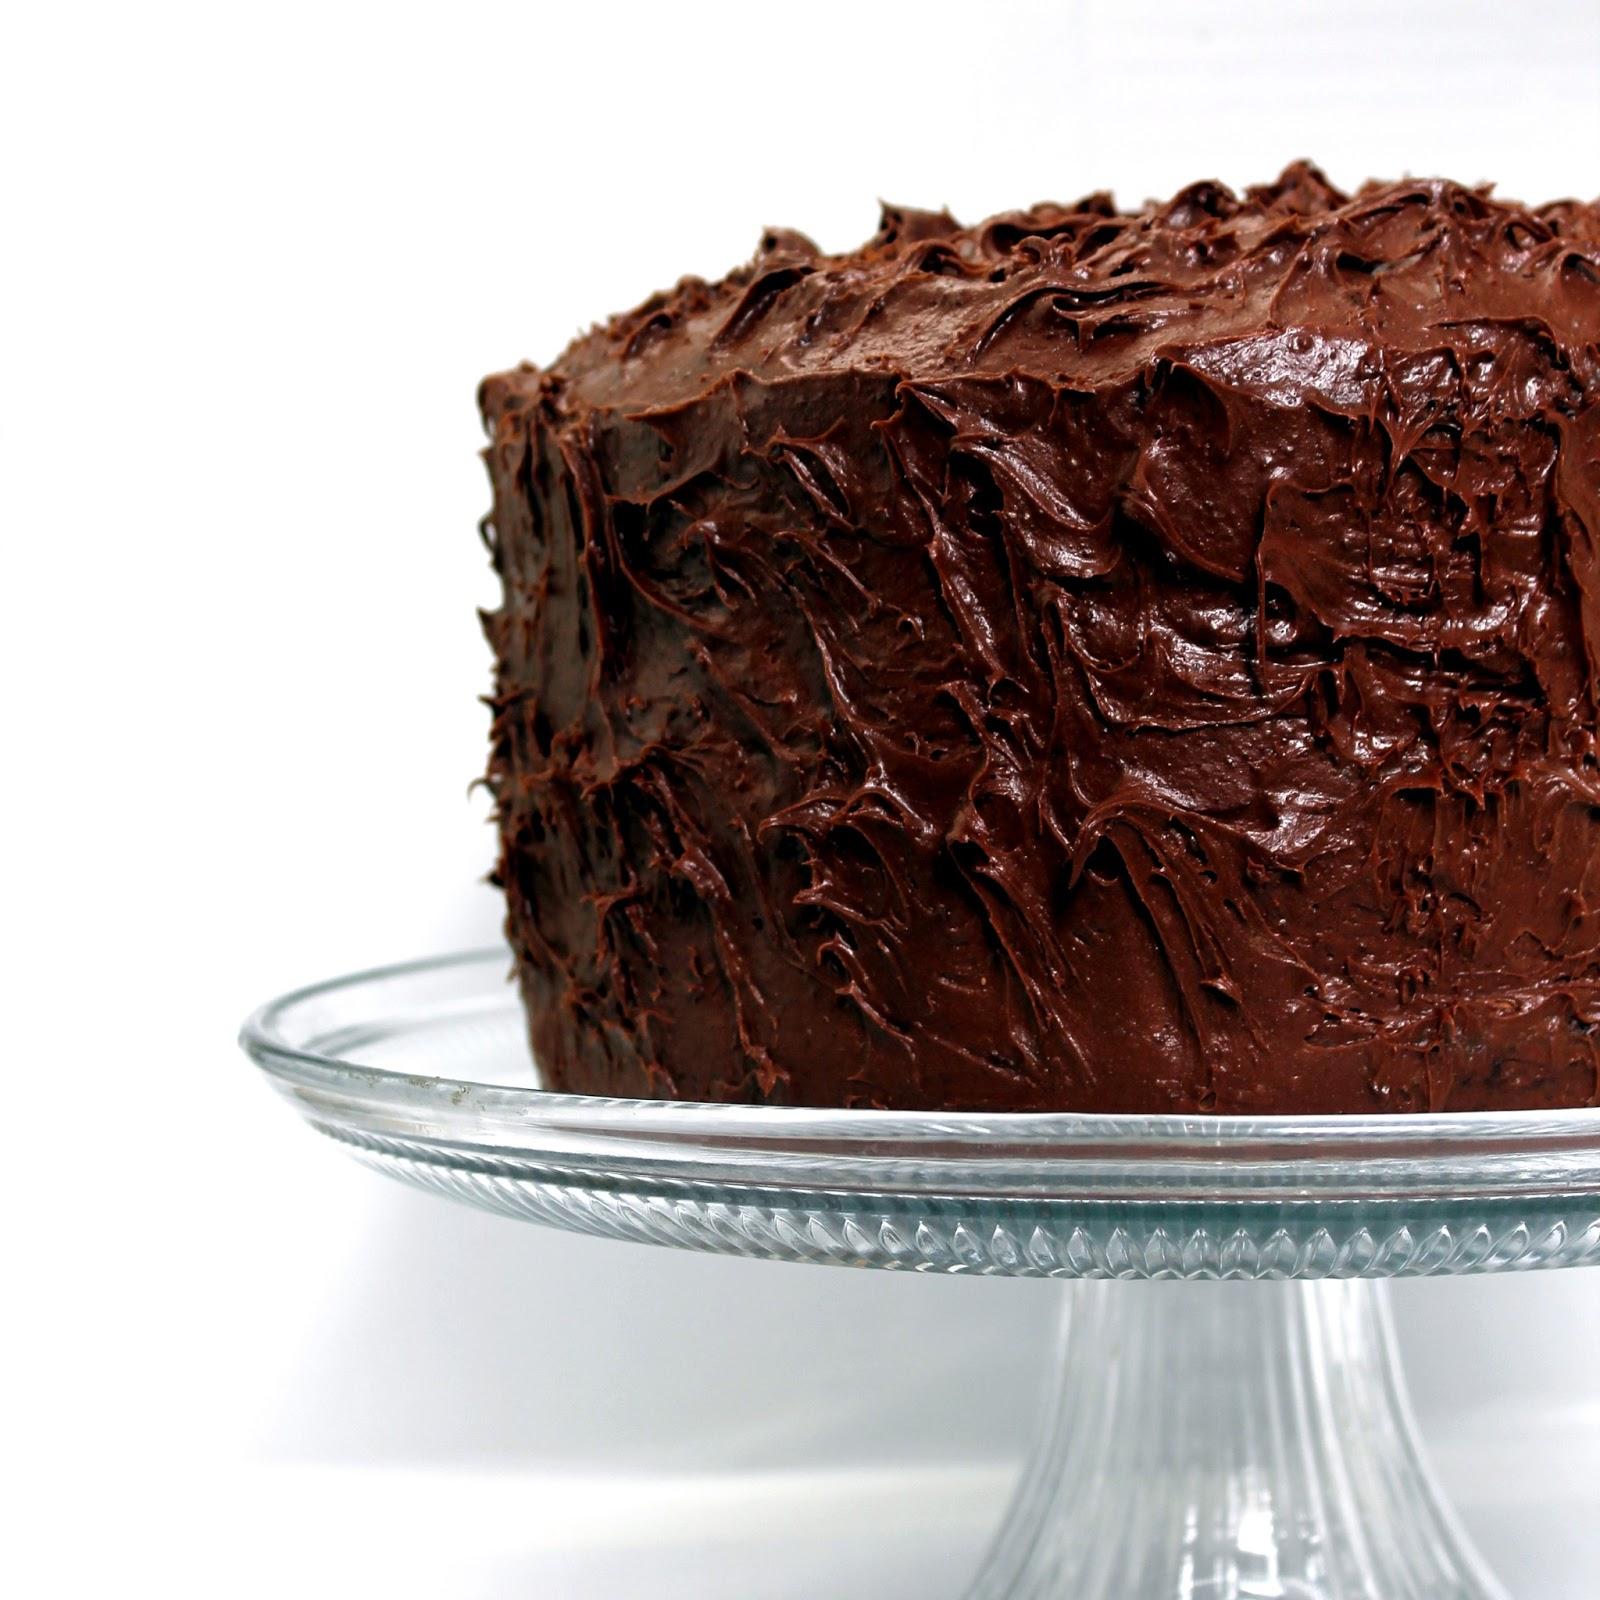 Amazing Chocolate Cake An amazing chocolate cake.